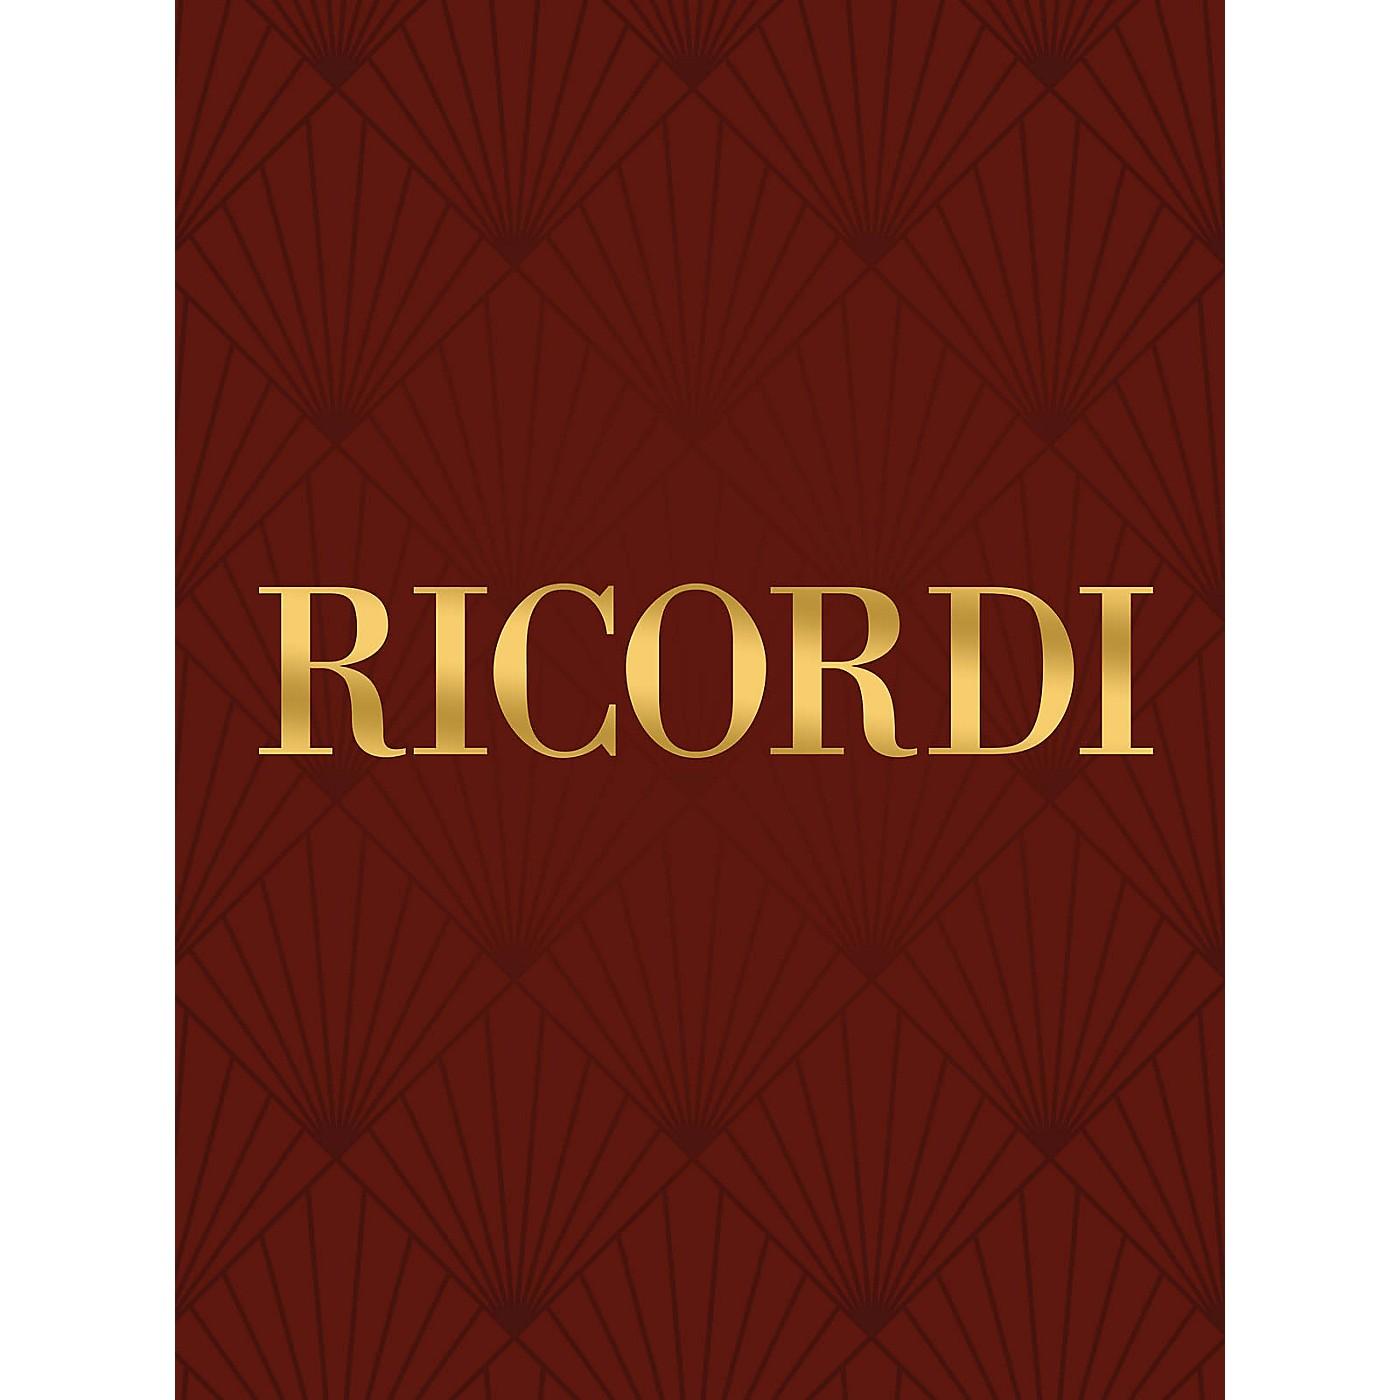 Ricordi Salve Regina RV616 (Vocal Score) Composed by Antonio Vivaldi Edited by Francesco Pigato thumbnail